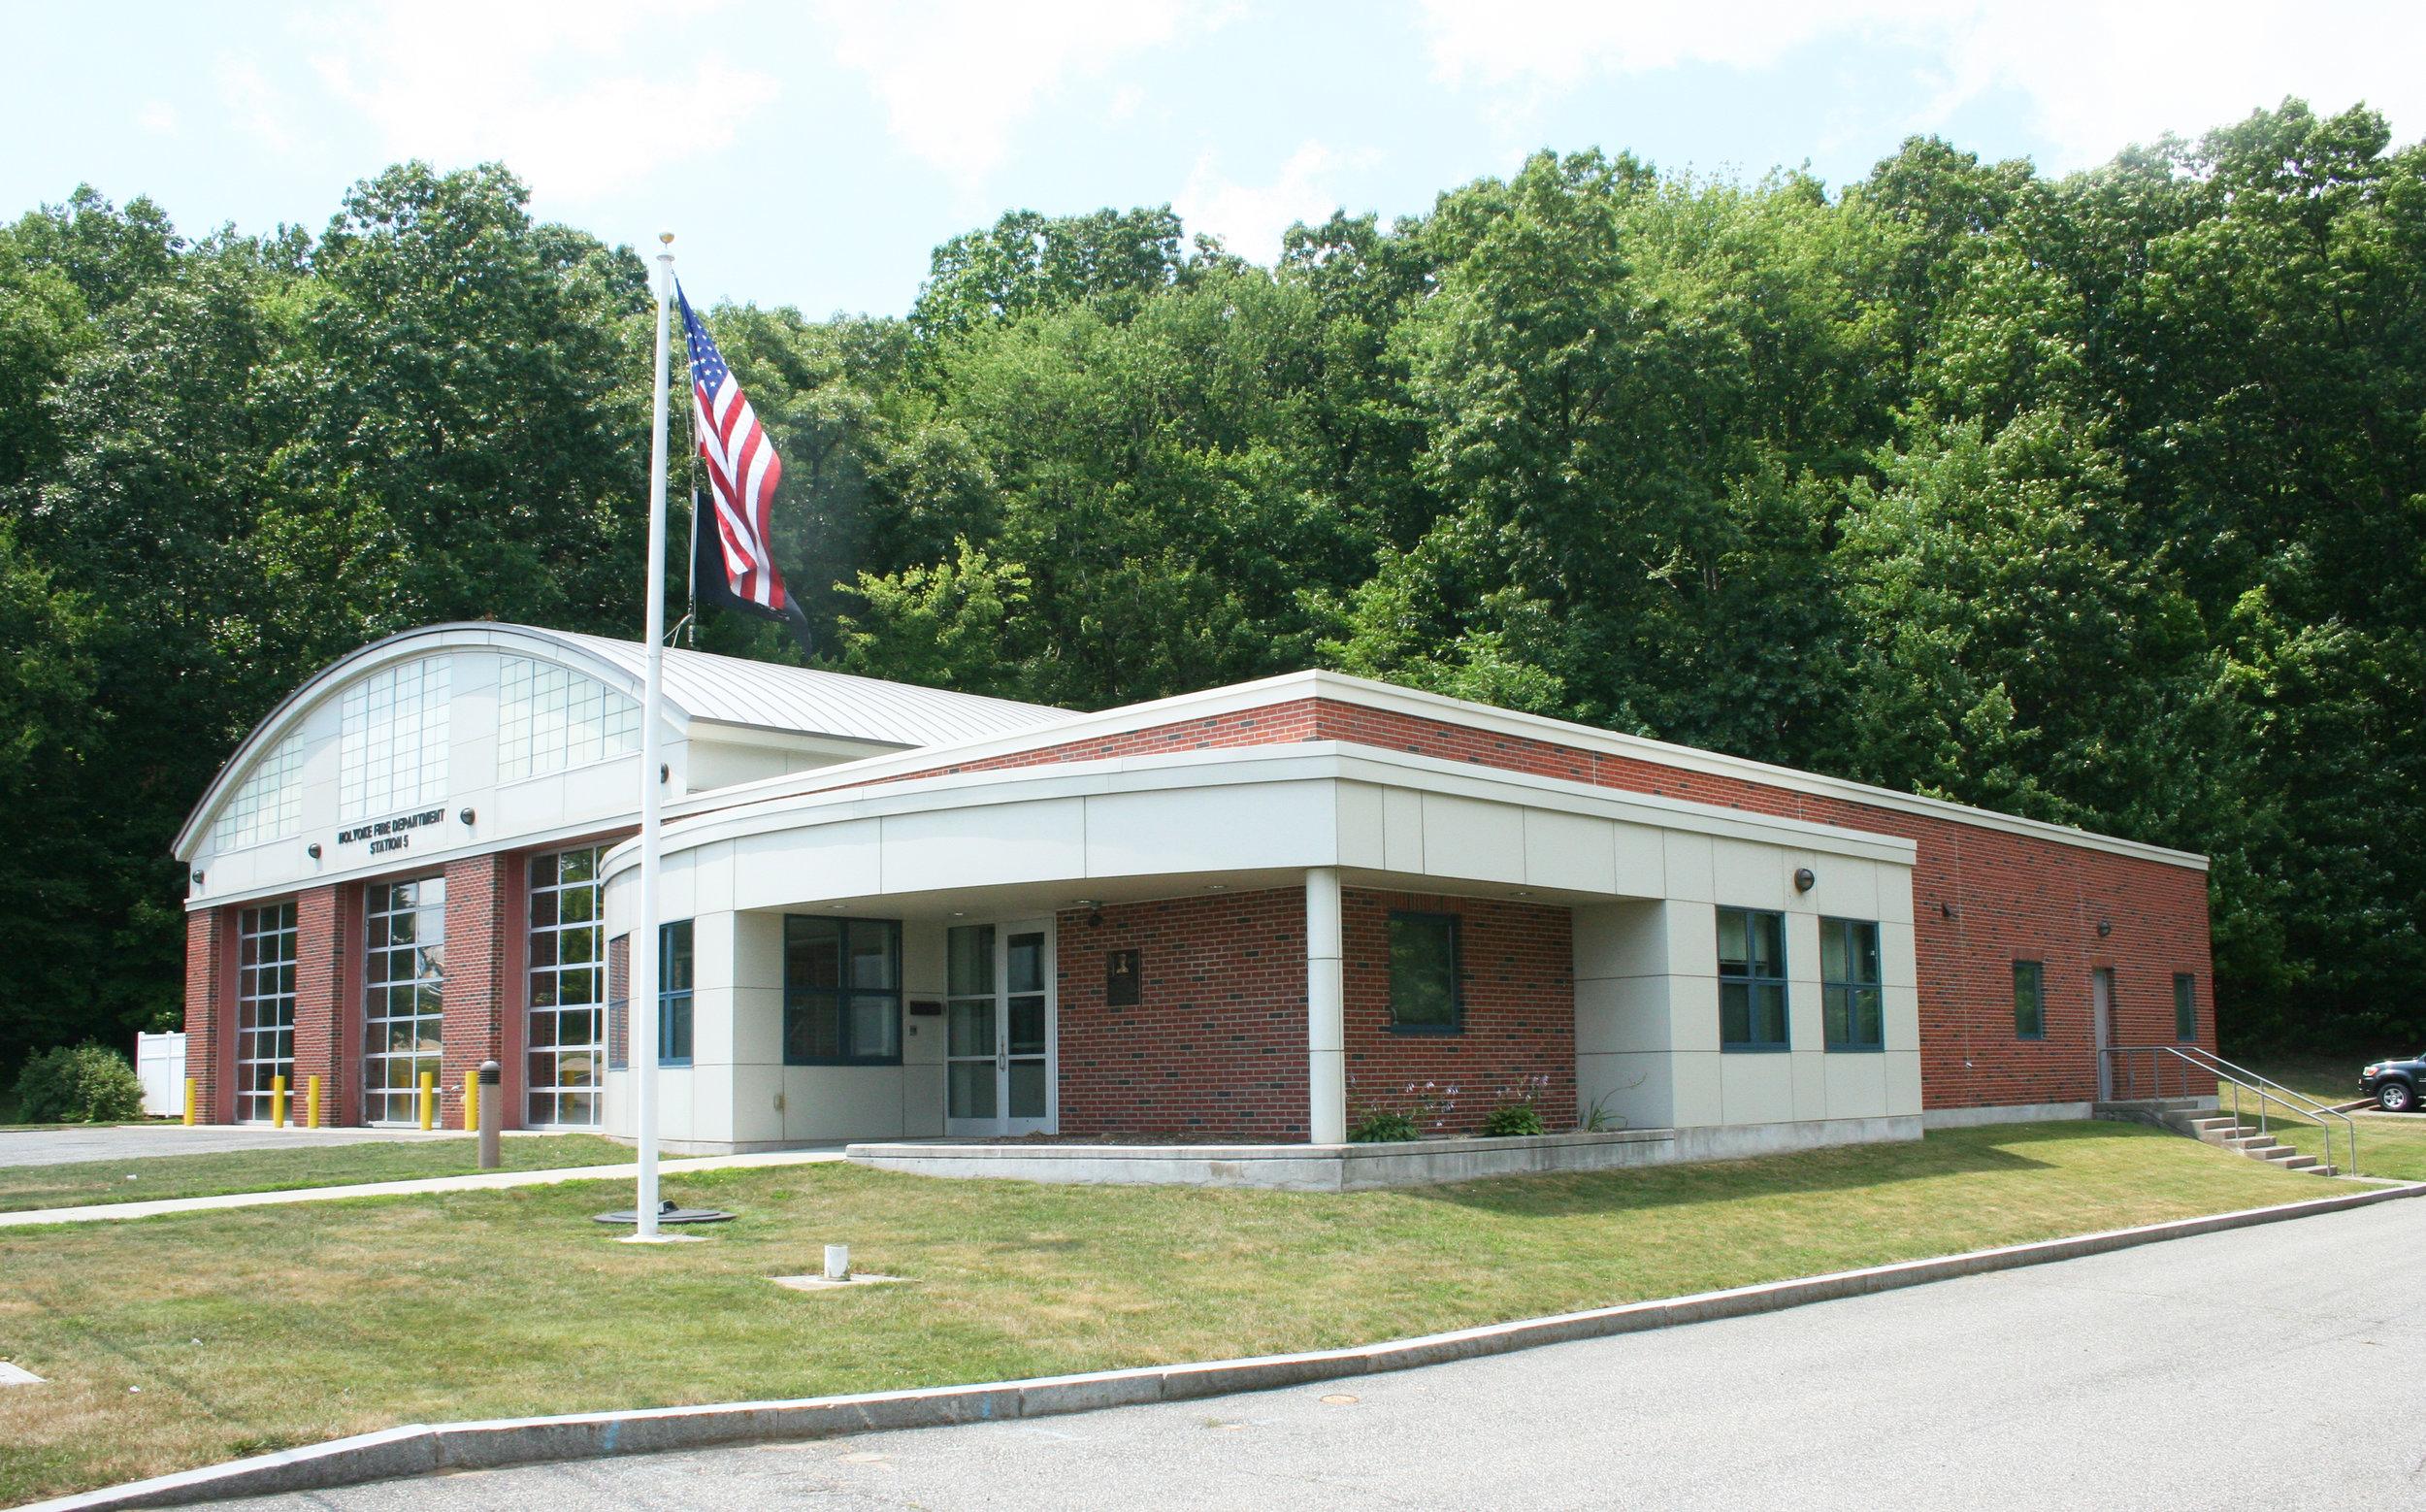 Holyoke Fire Station 5